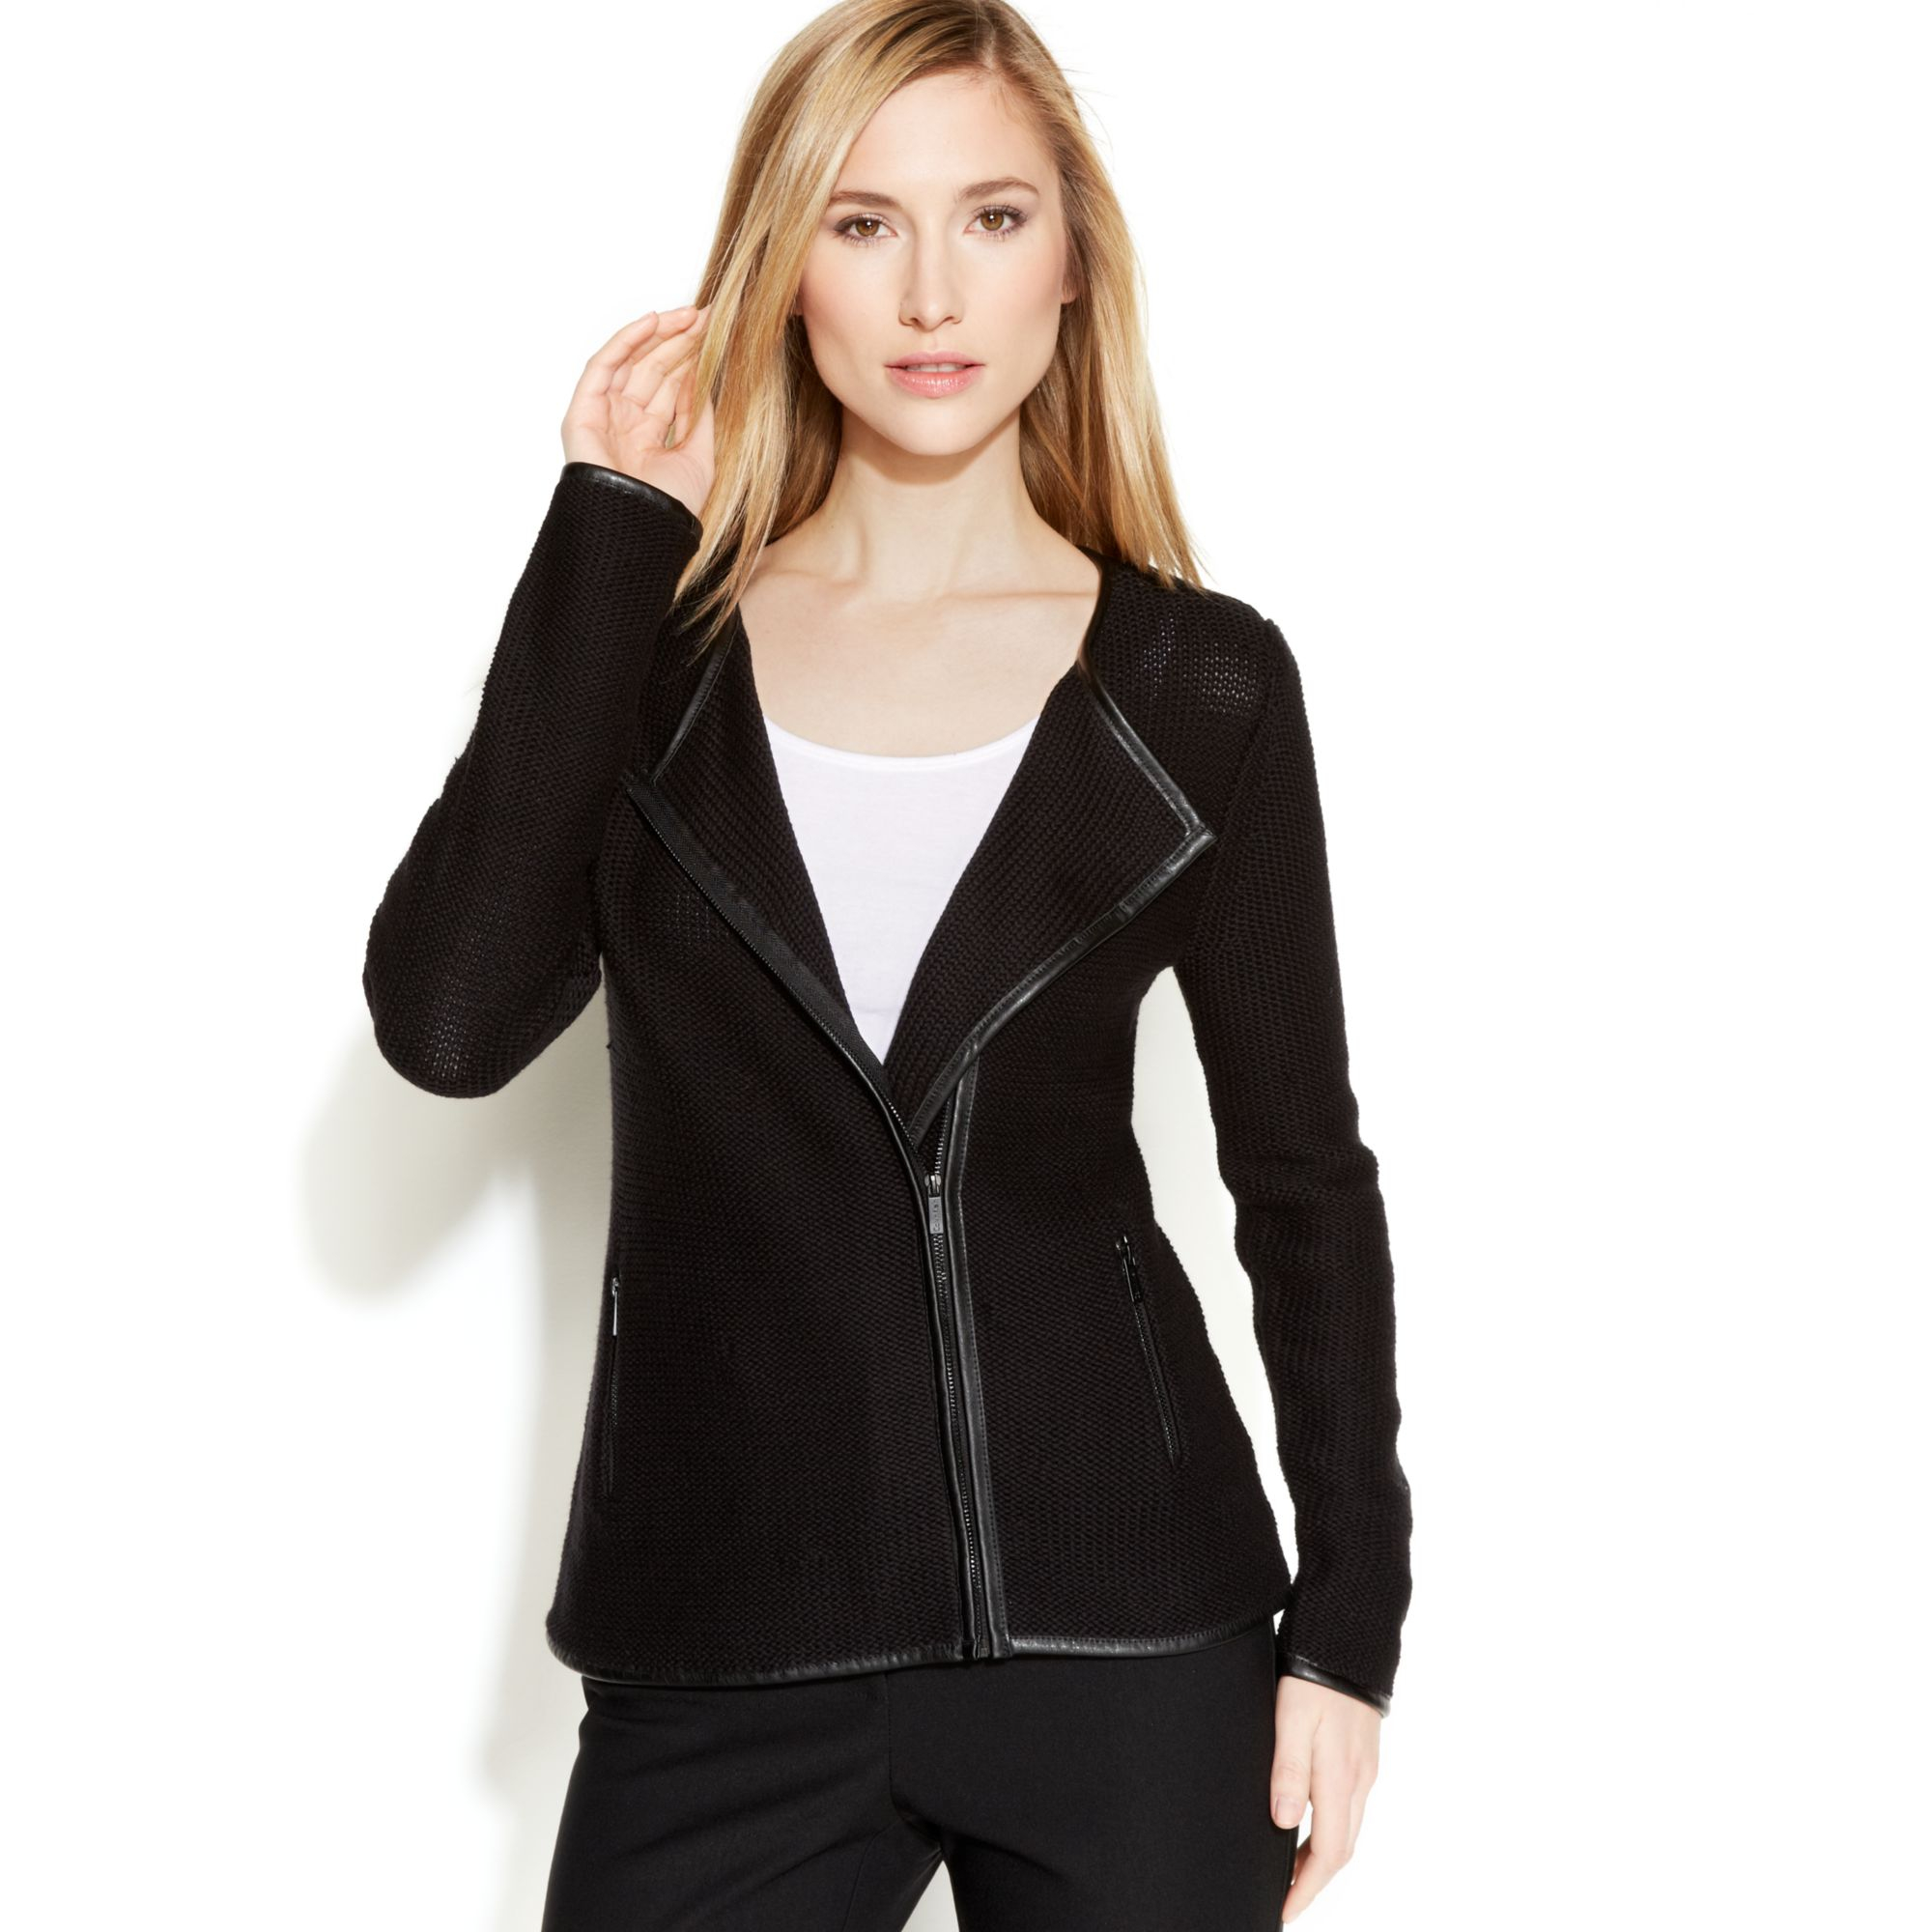 calvin klein zipfront knit sweater jacket in black lyst. Black Bedroom Furniture Sets. Home Design Ideas